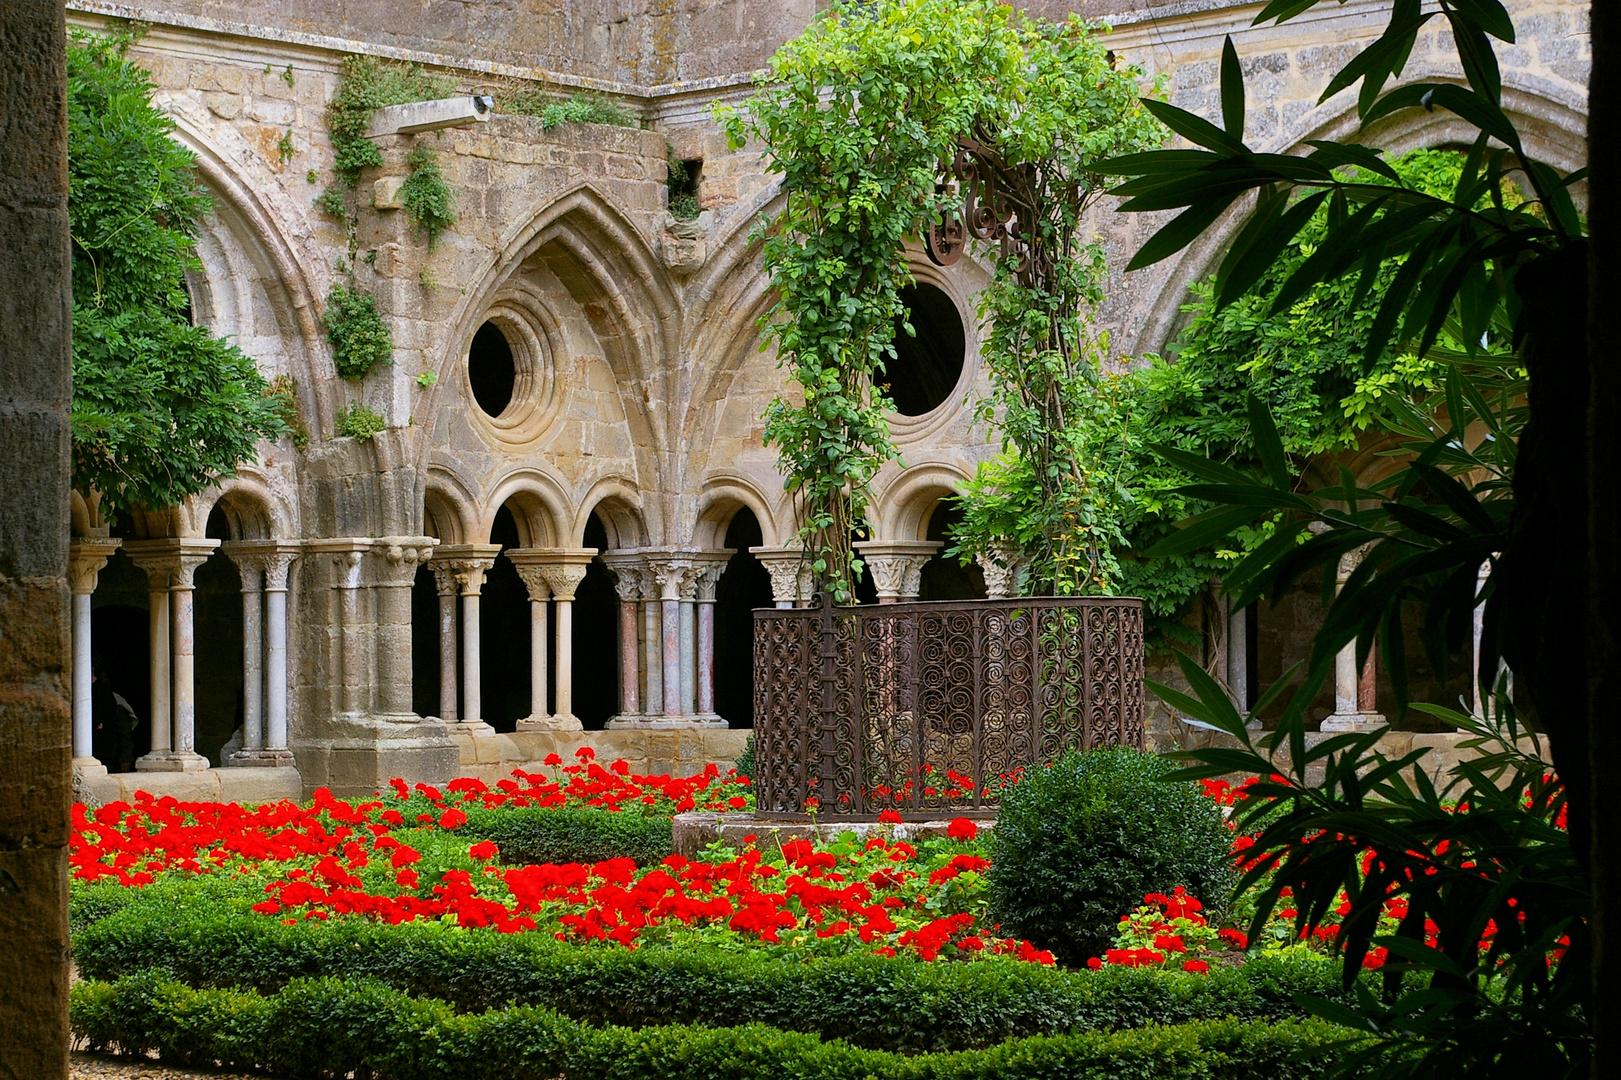 Abtei Sainte-Marie de Fontfroide